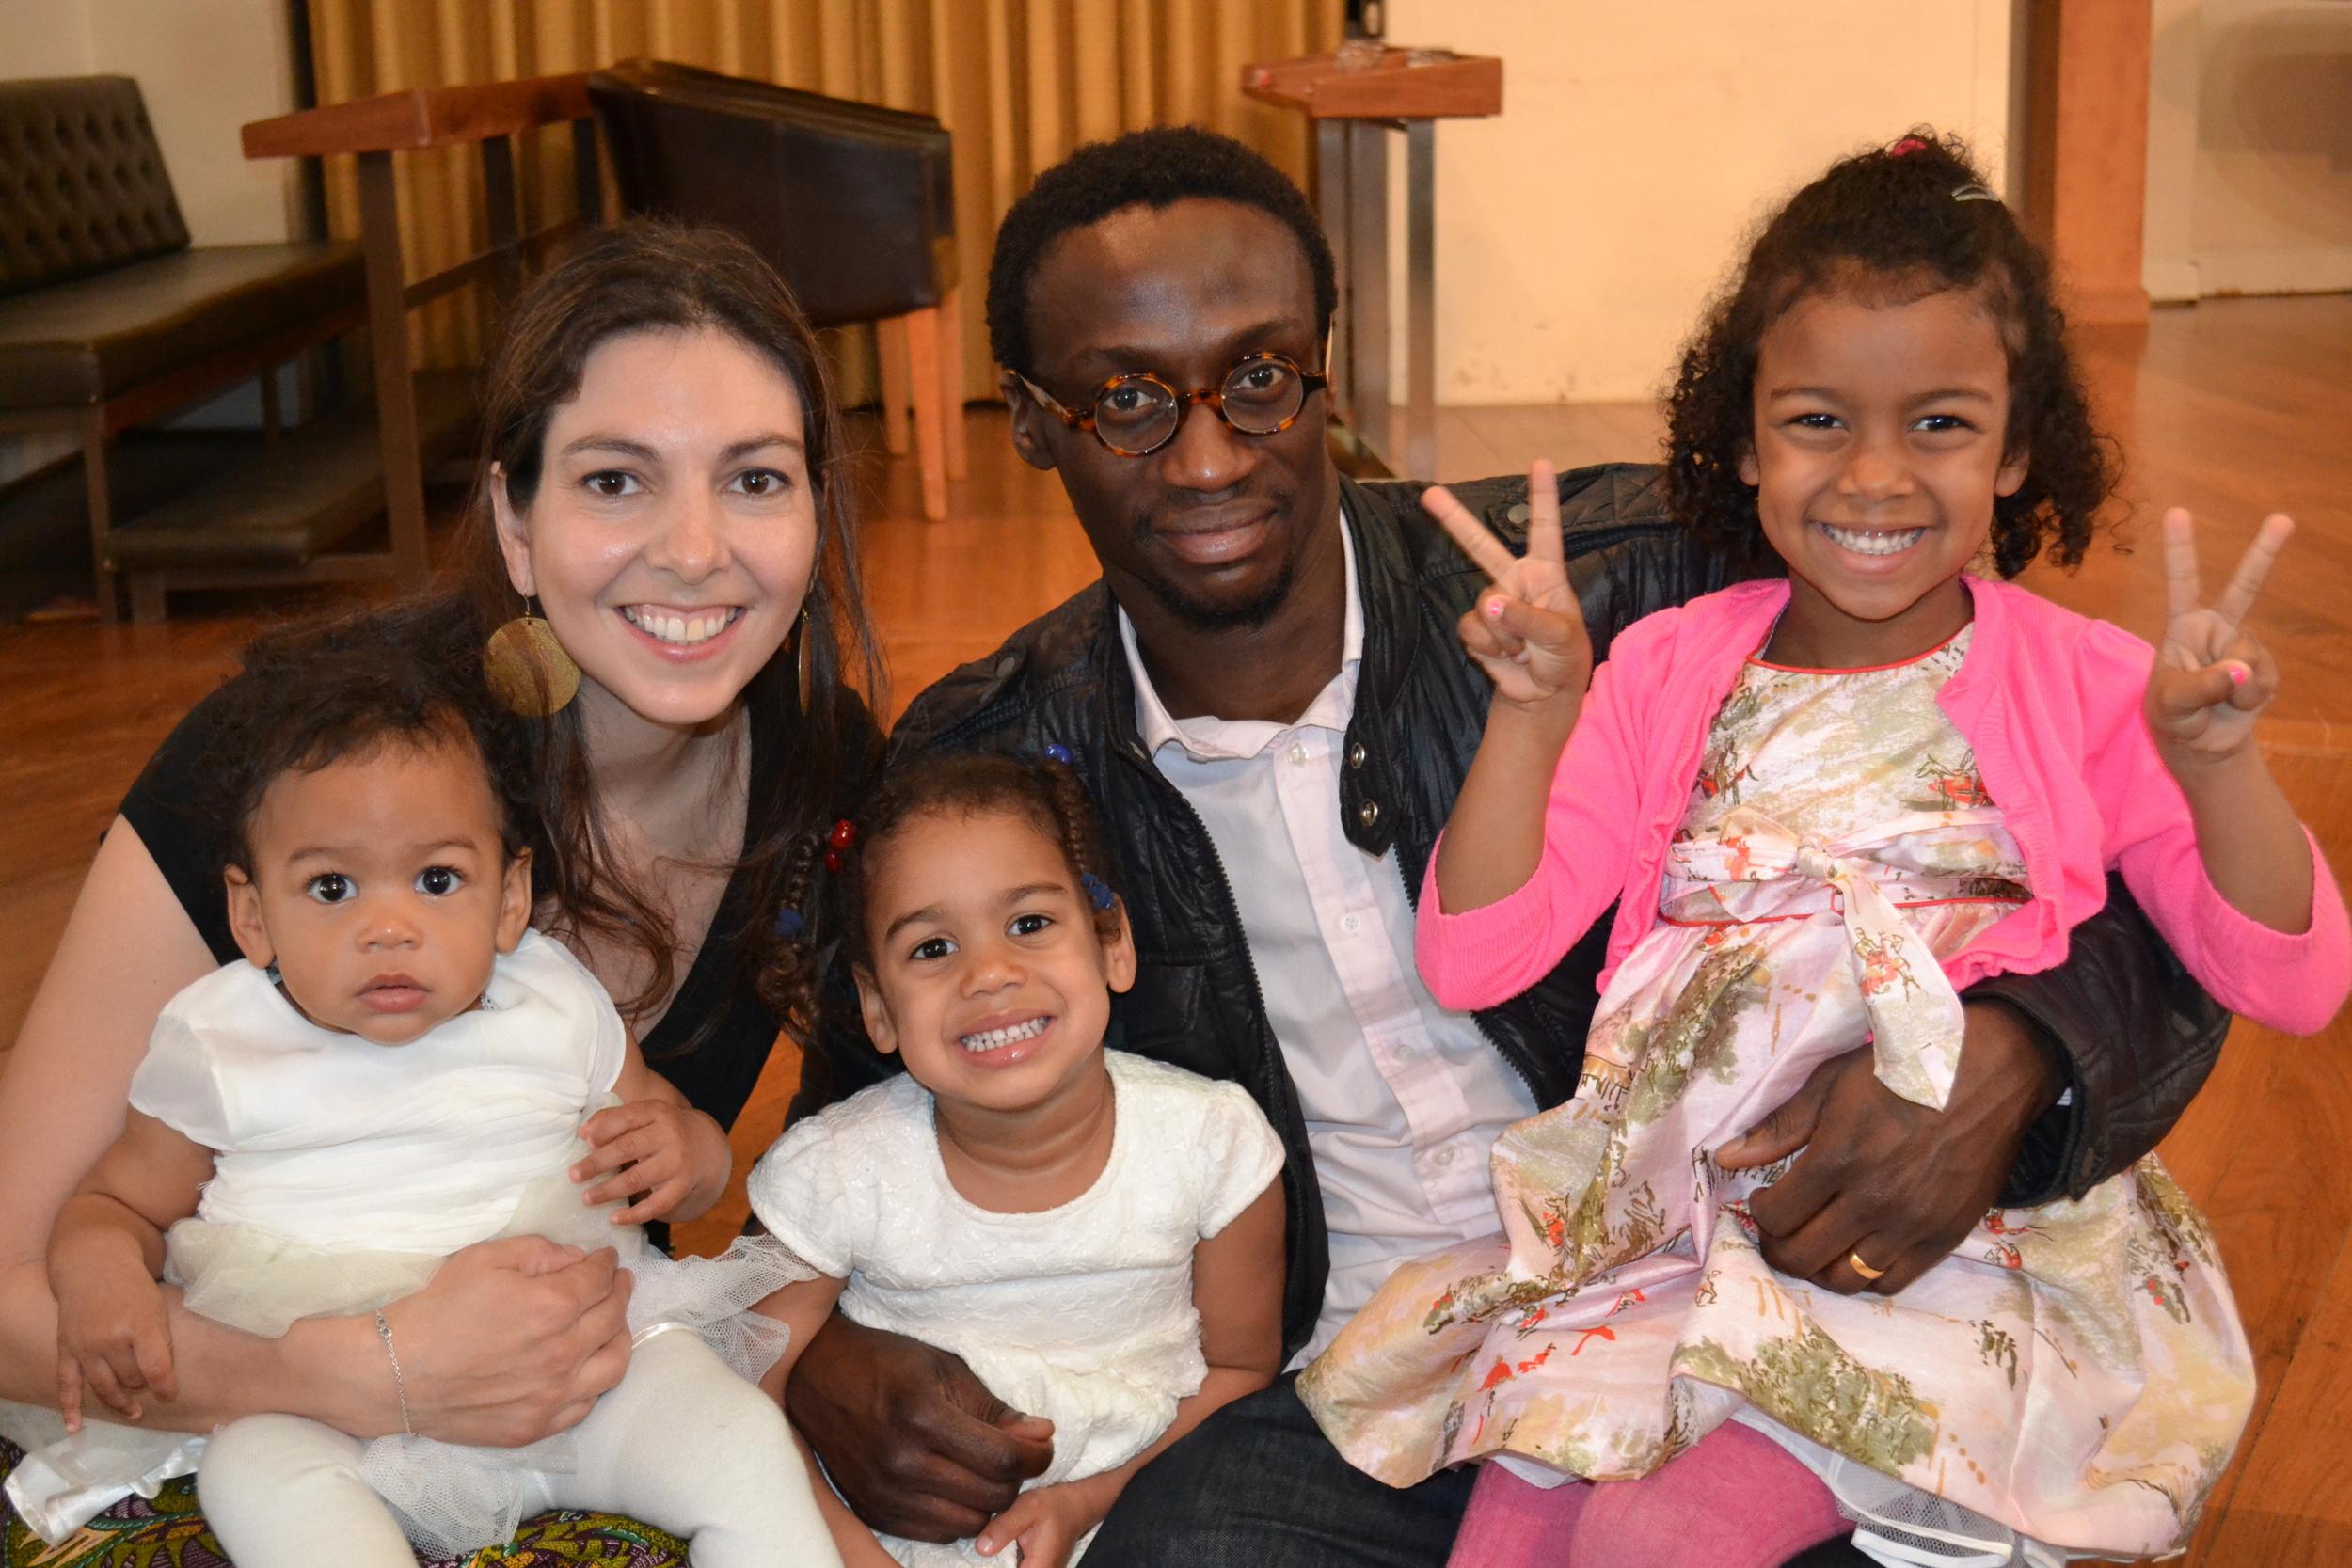 FEATURED MULTIRACIAL FAMILY MEET THE SOETAN FAMILY via Swirl Nation Blog